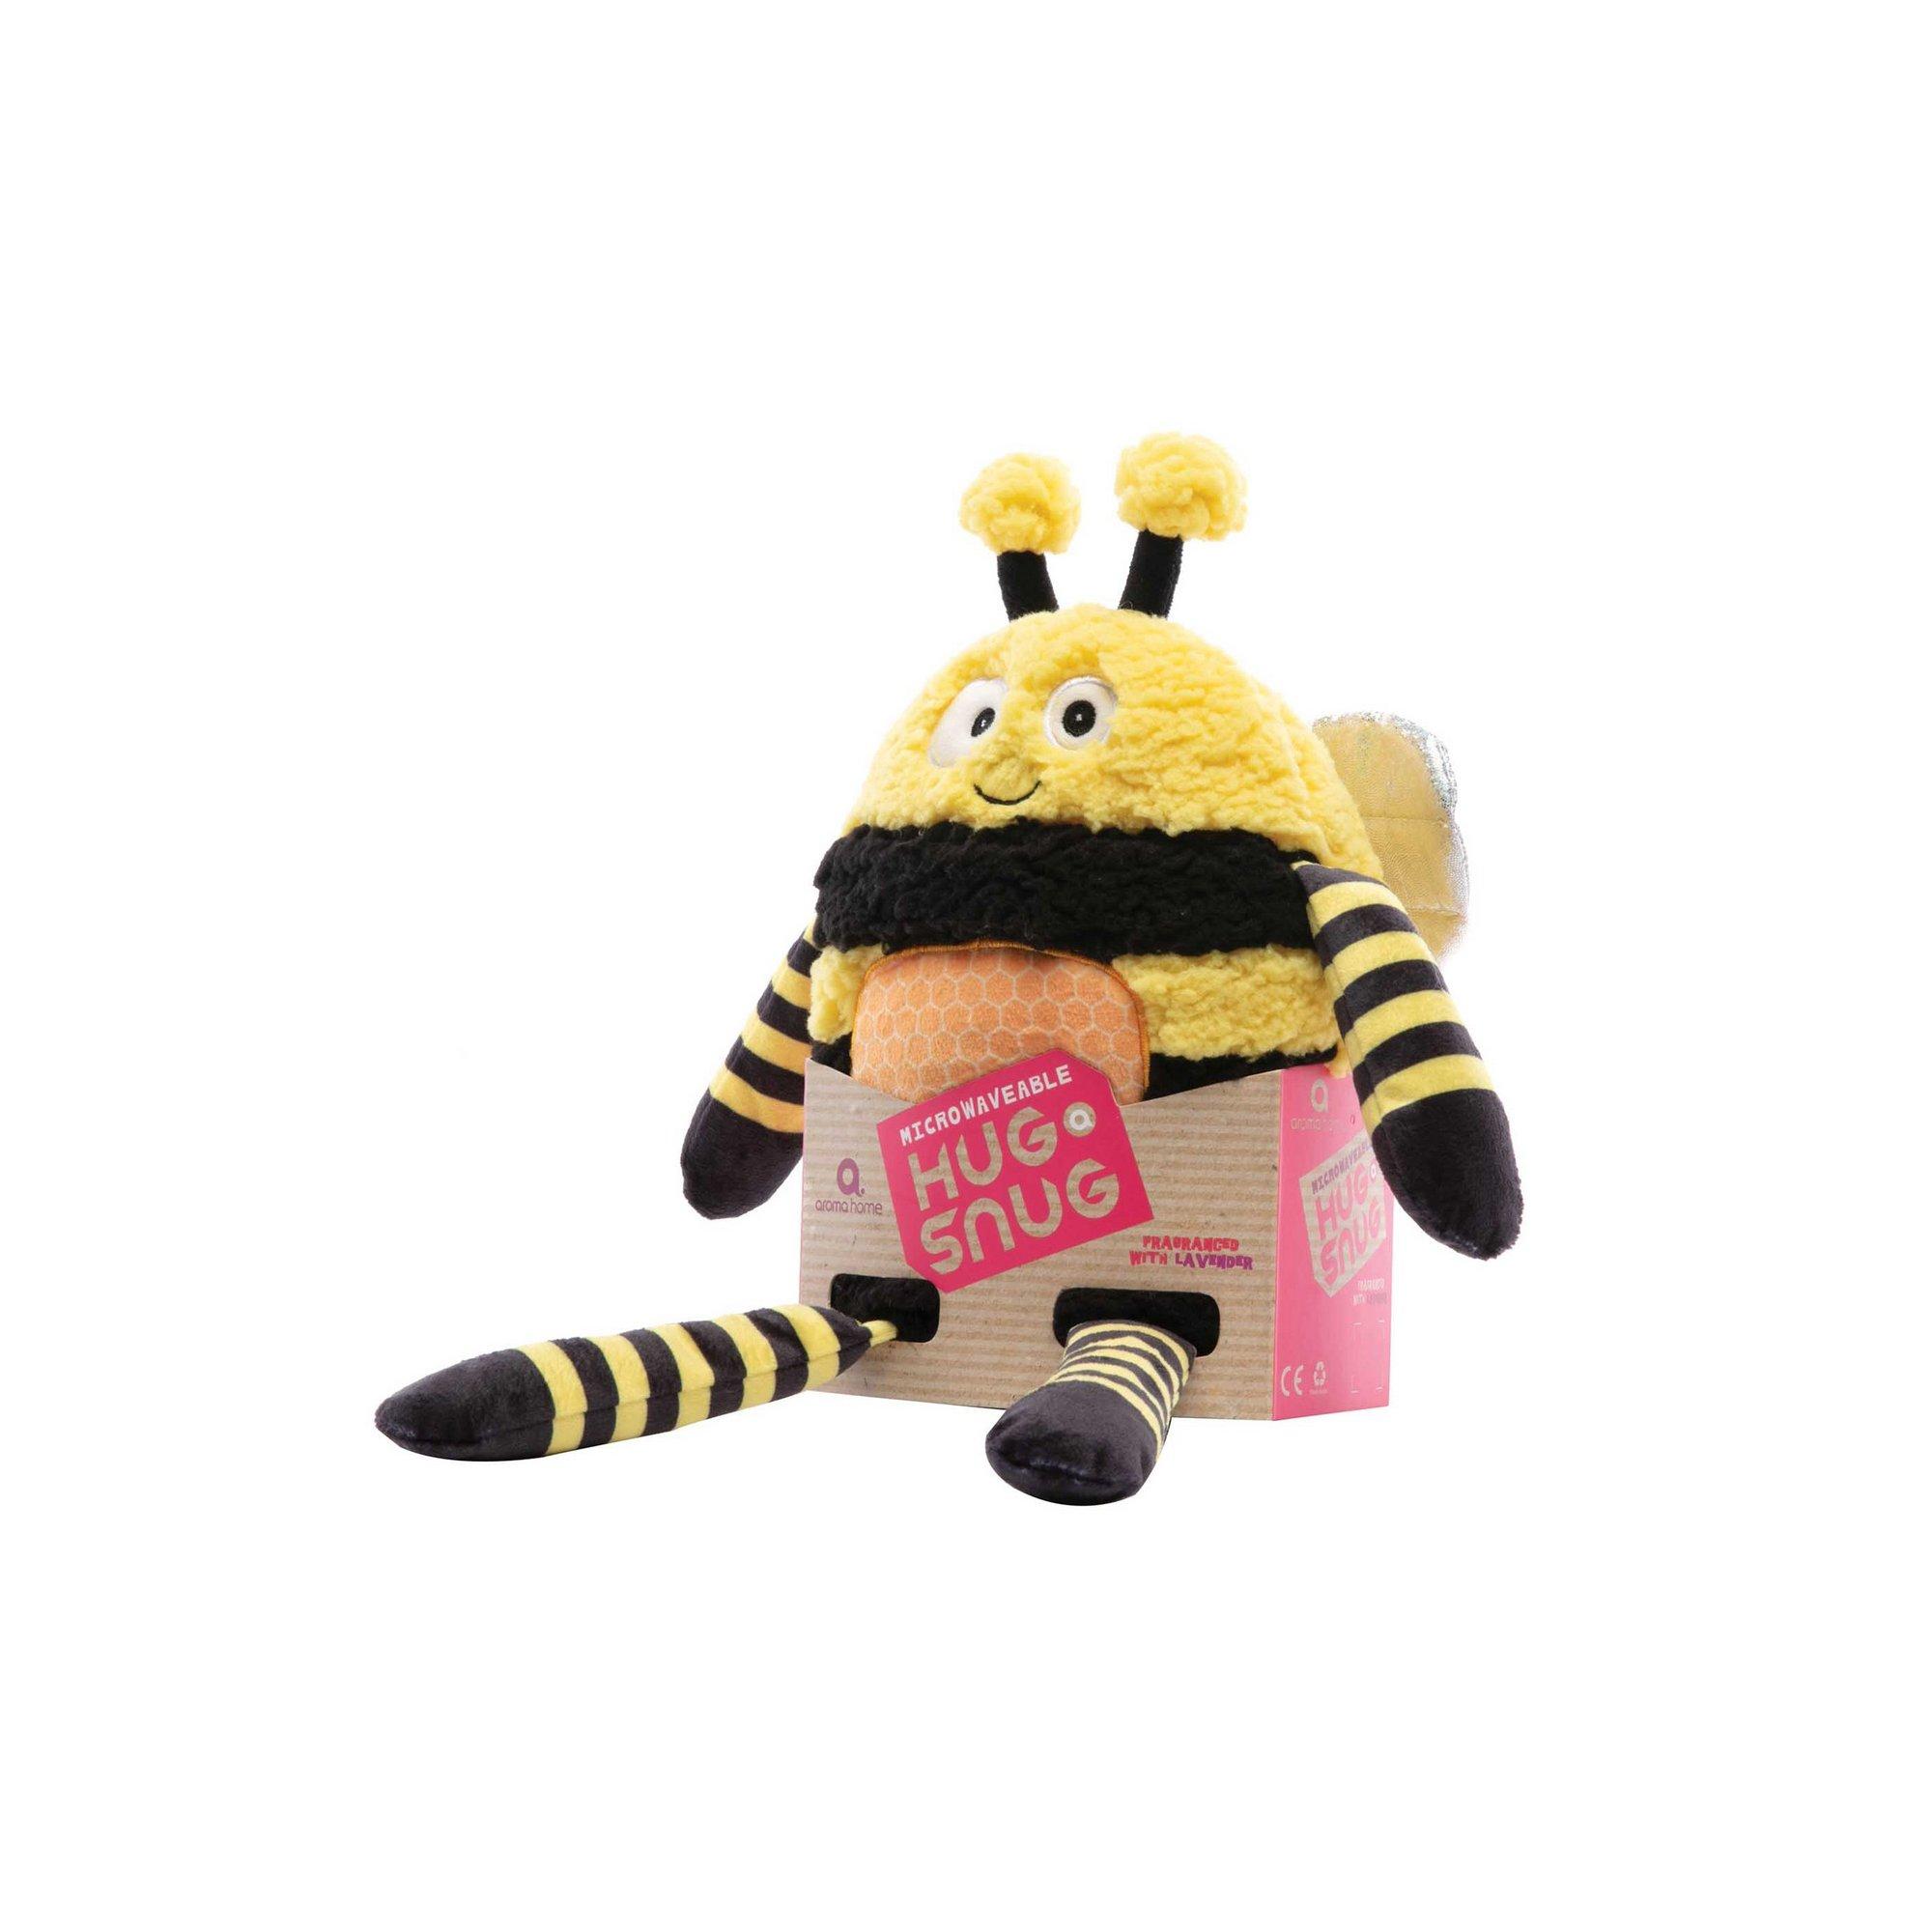 Image of Bumble Bee Heatable Scented Hug a Snug